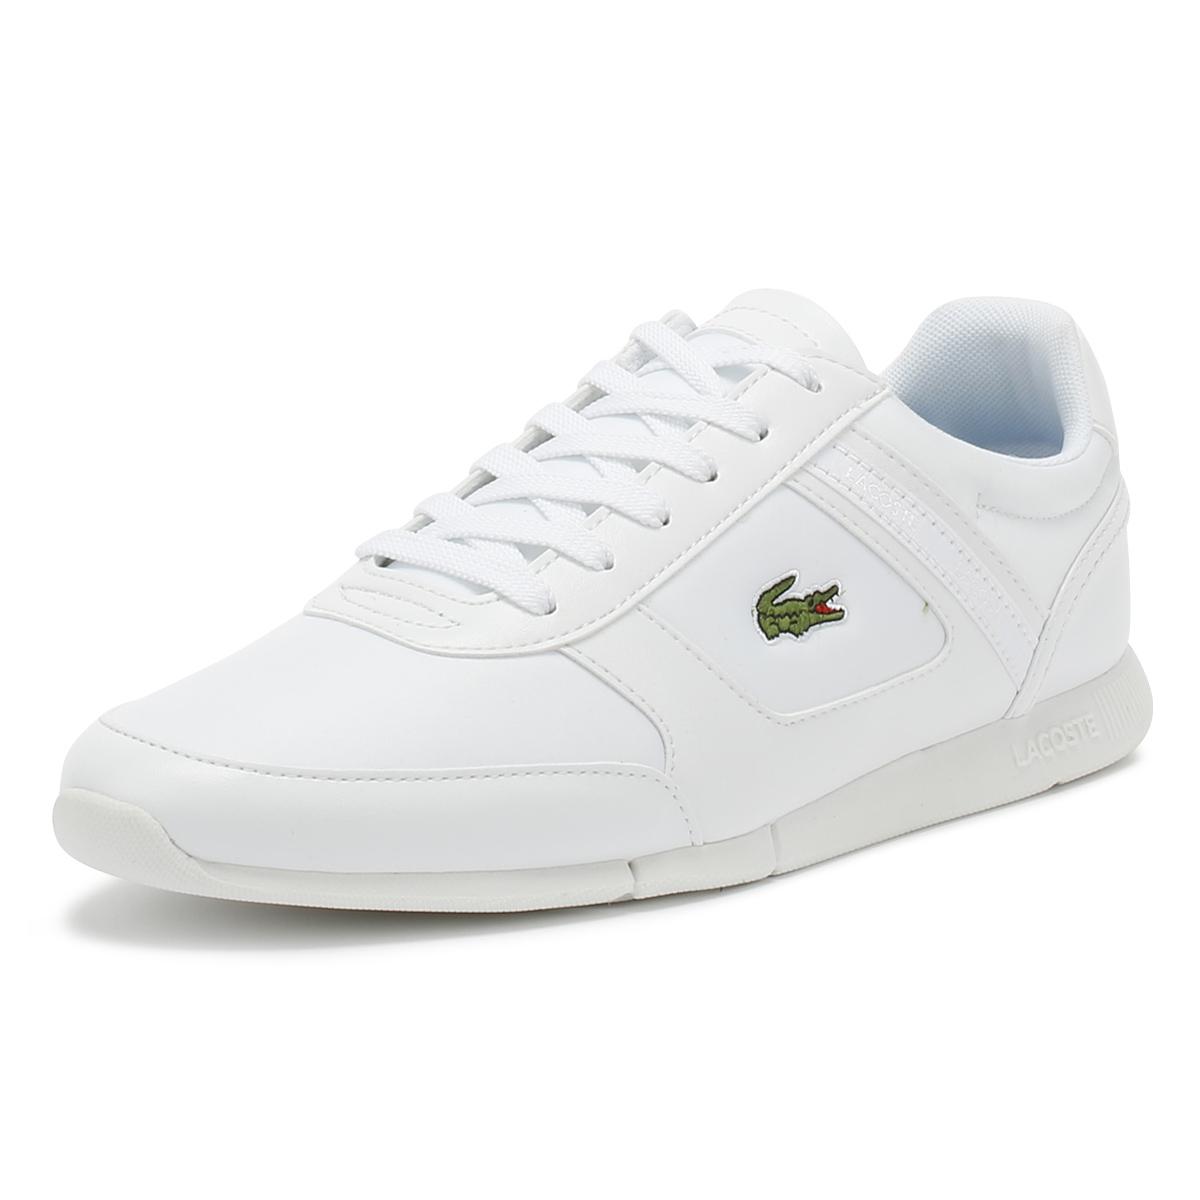 3e52e242c37c6f Details about Lacoste Mens Trainers White Menerva Sport 318 2 Lace Up Sport  Casual Shoes